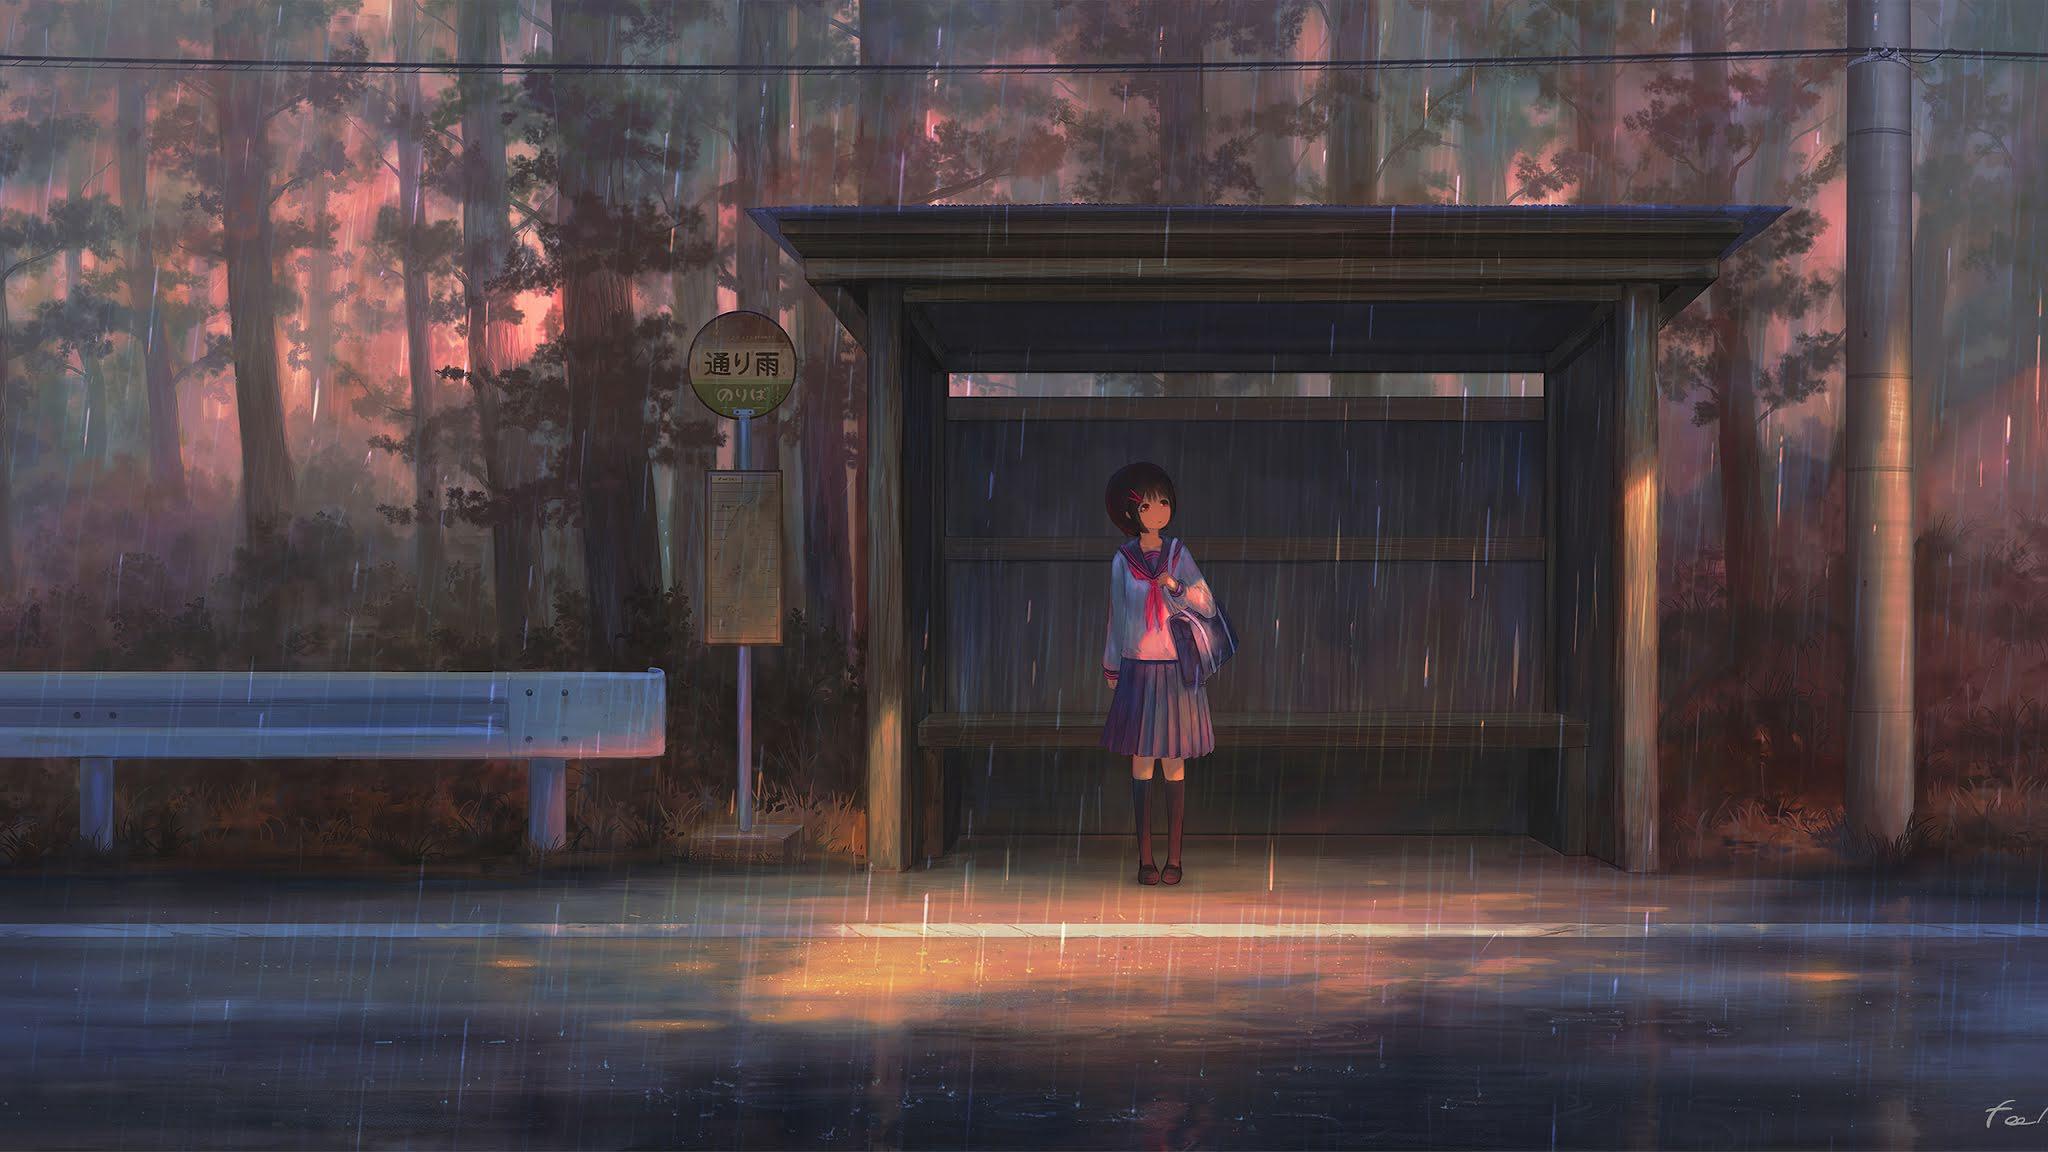 Anime Rain 4k Wallpapers - Wallpaper Cave